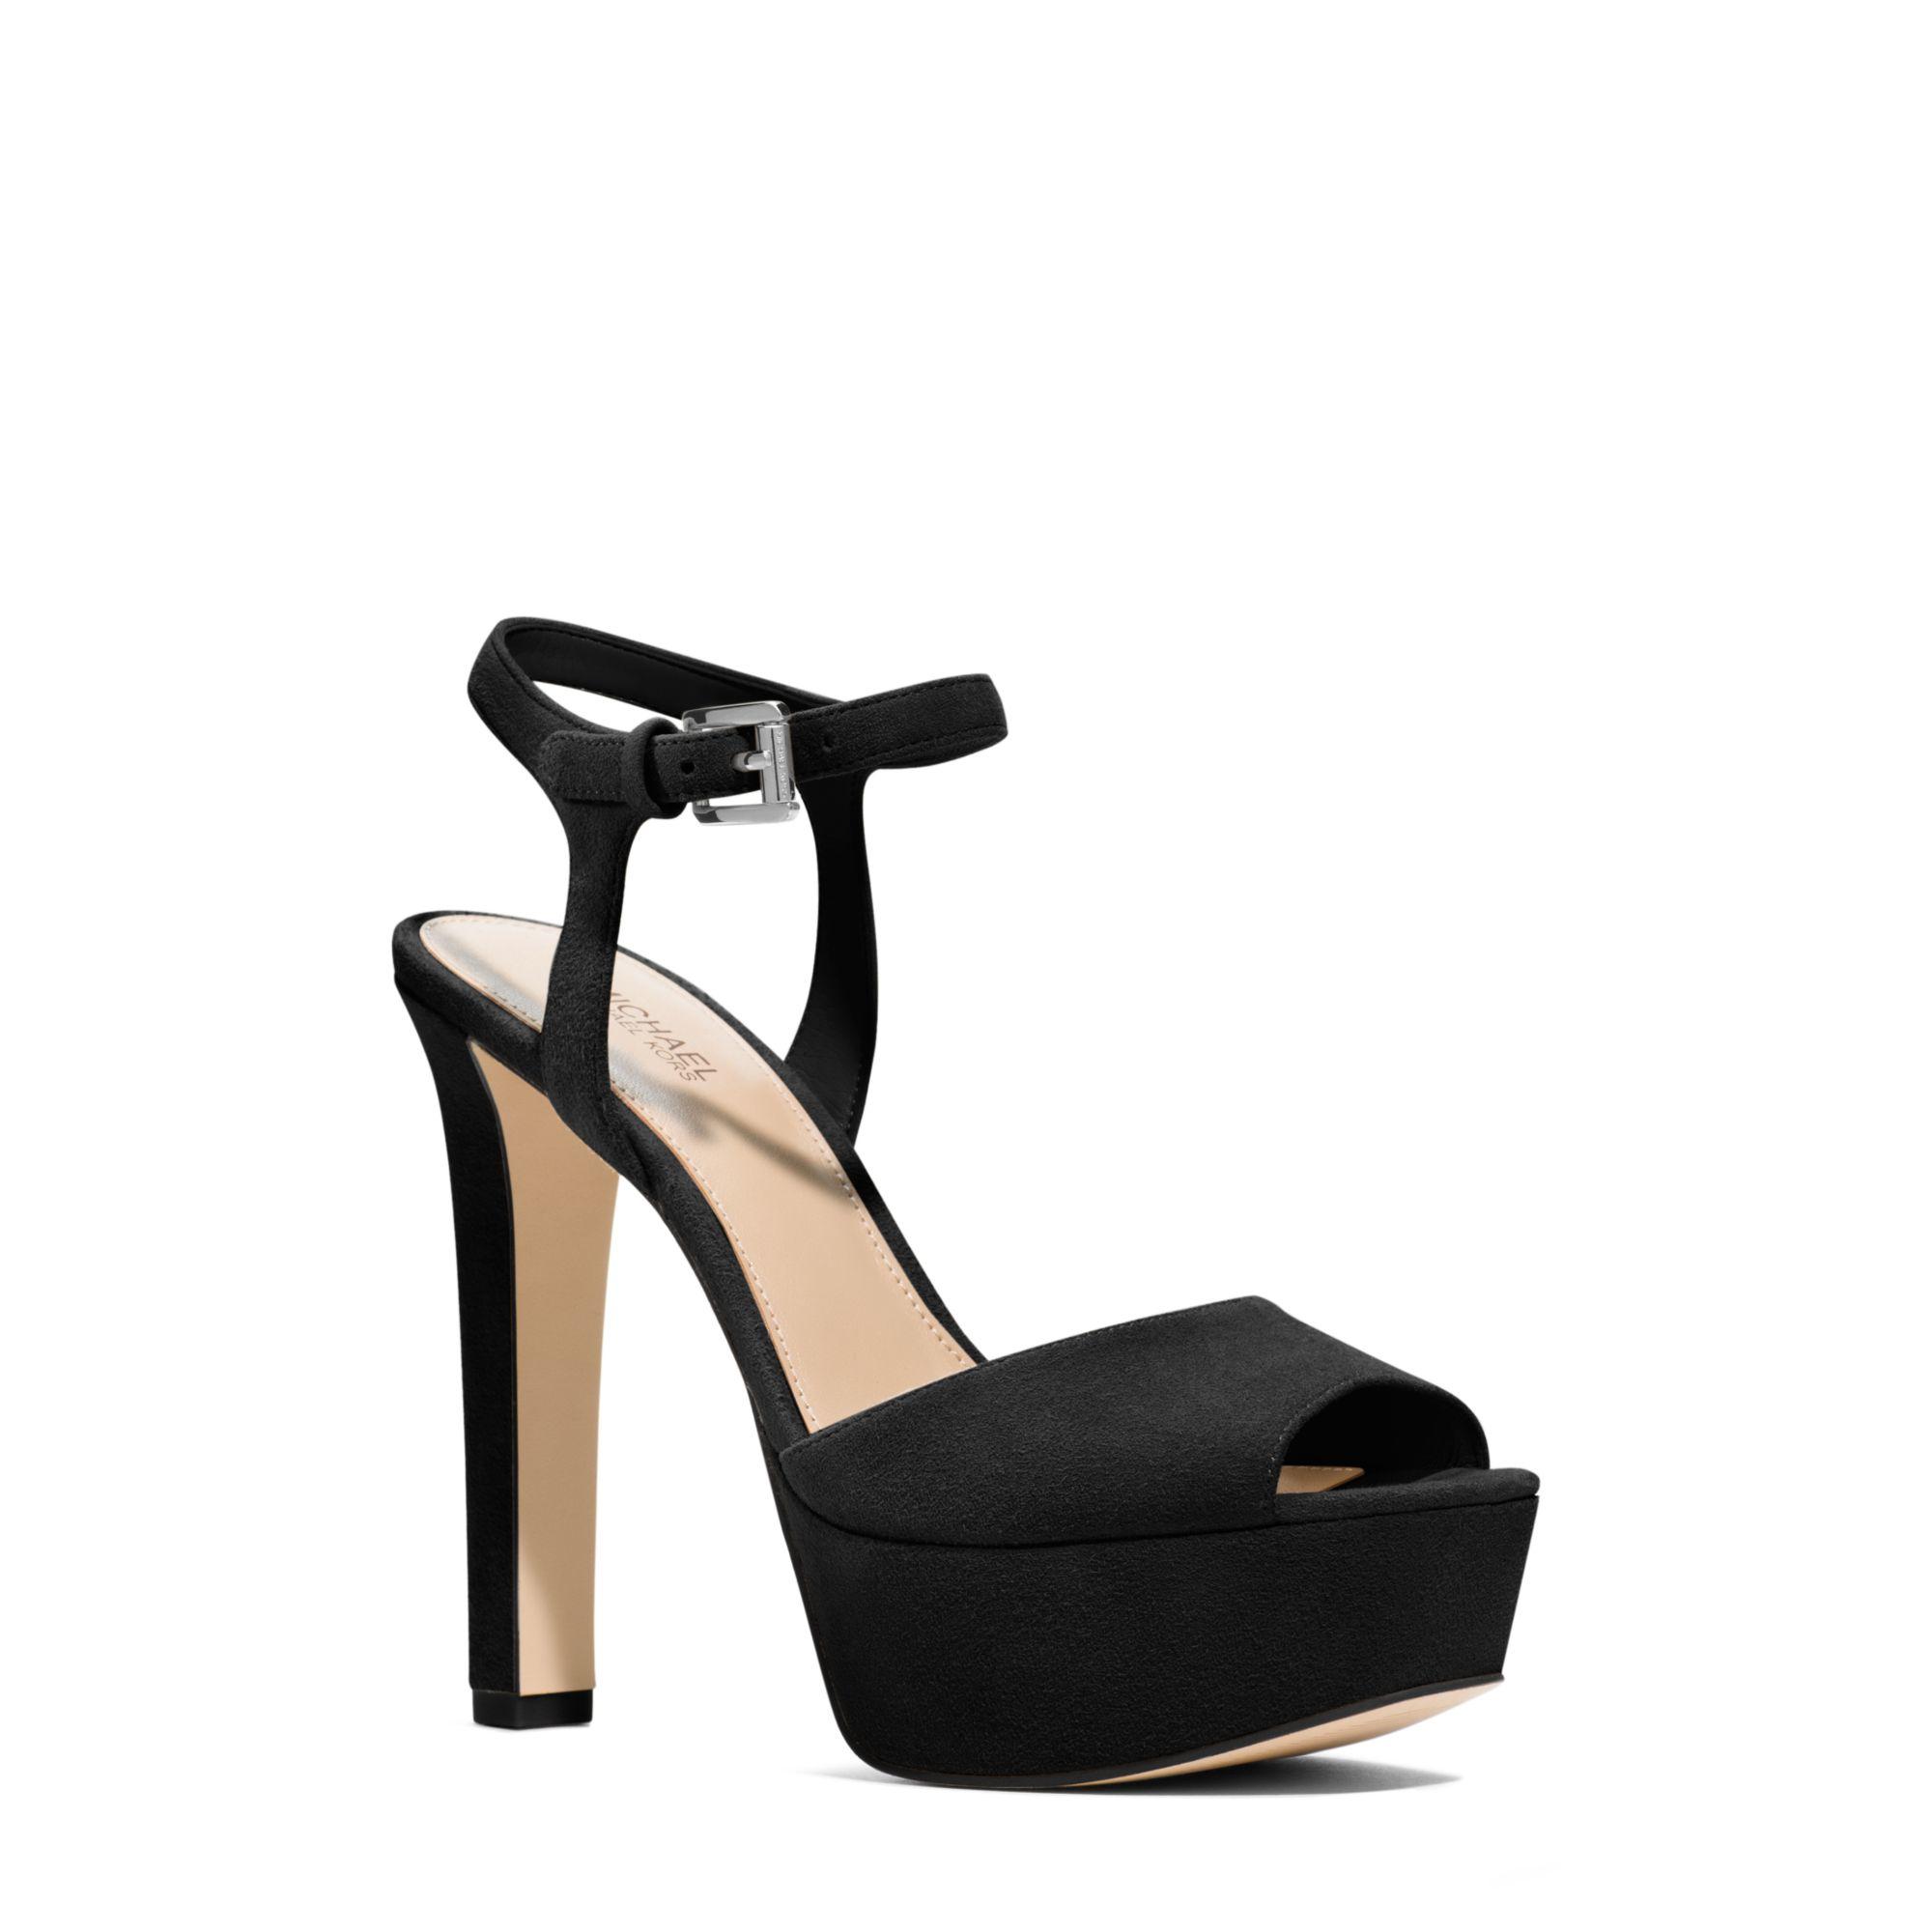 Black sandals belk - Gallery